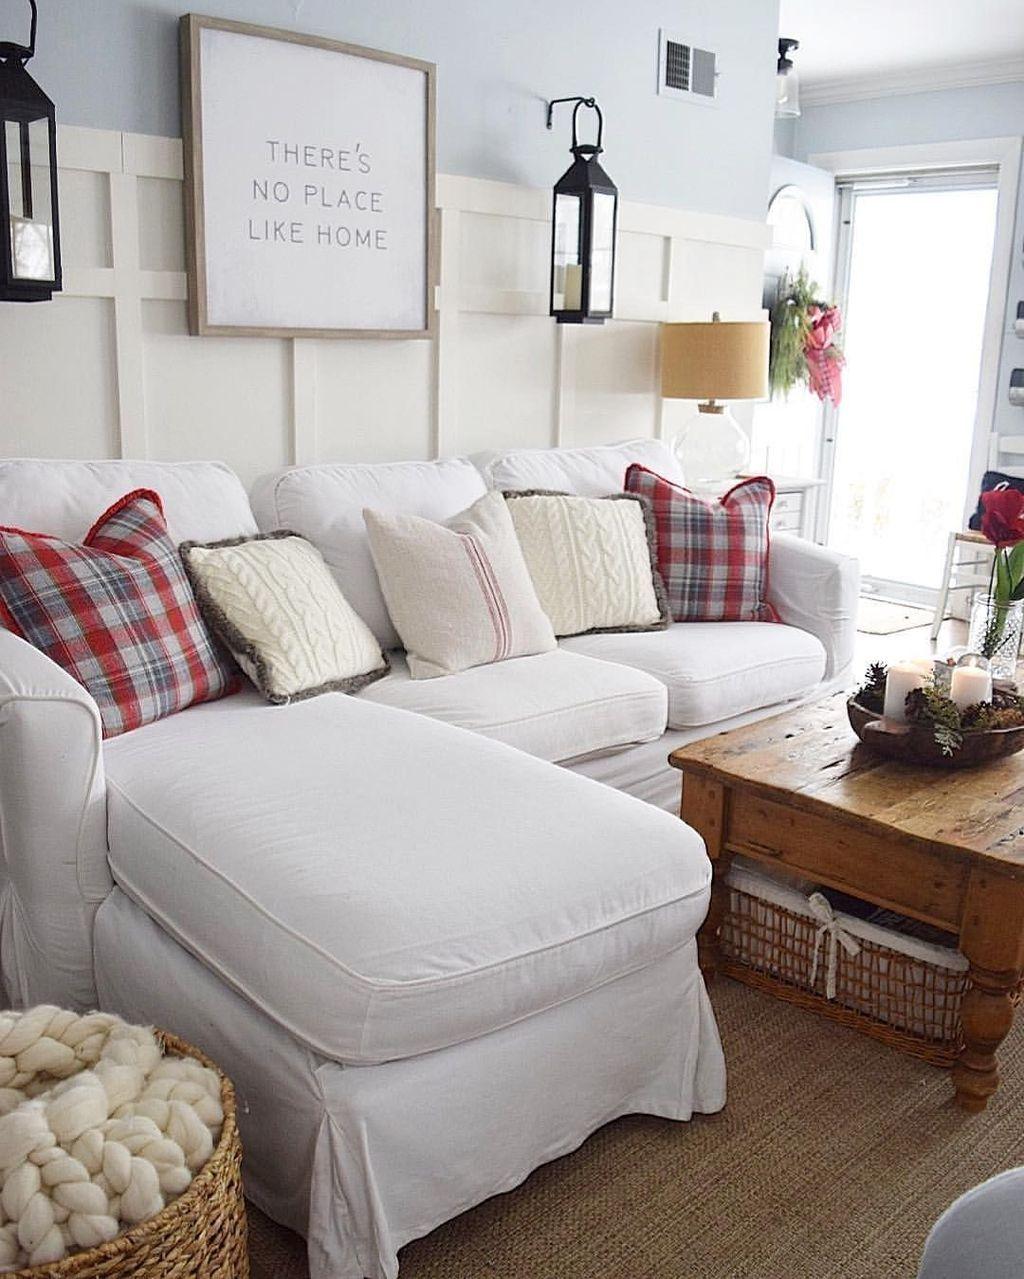 50 Amazing Winter Interior Design With Low Budget   Winter ...